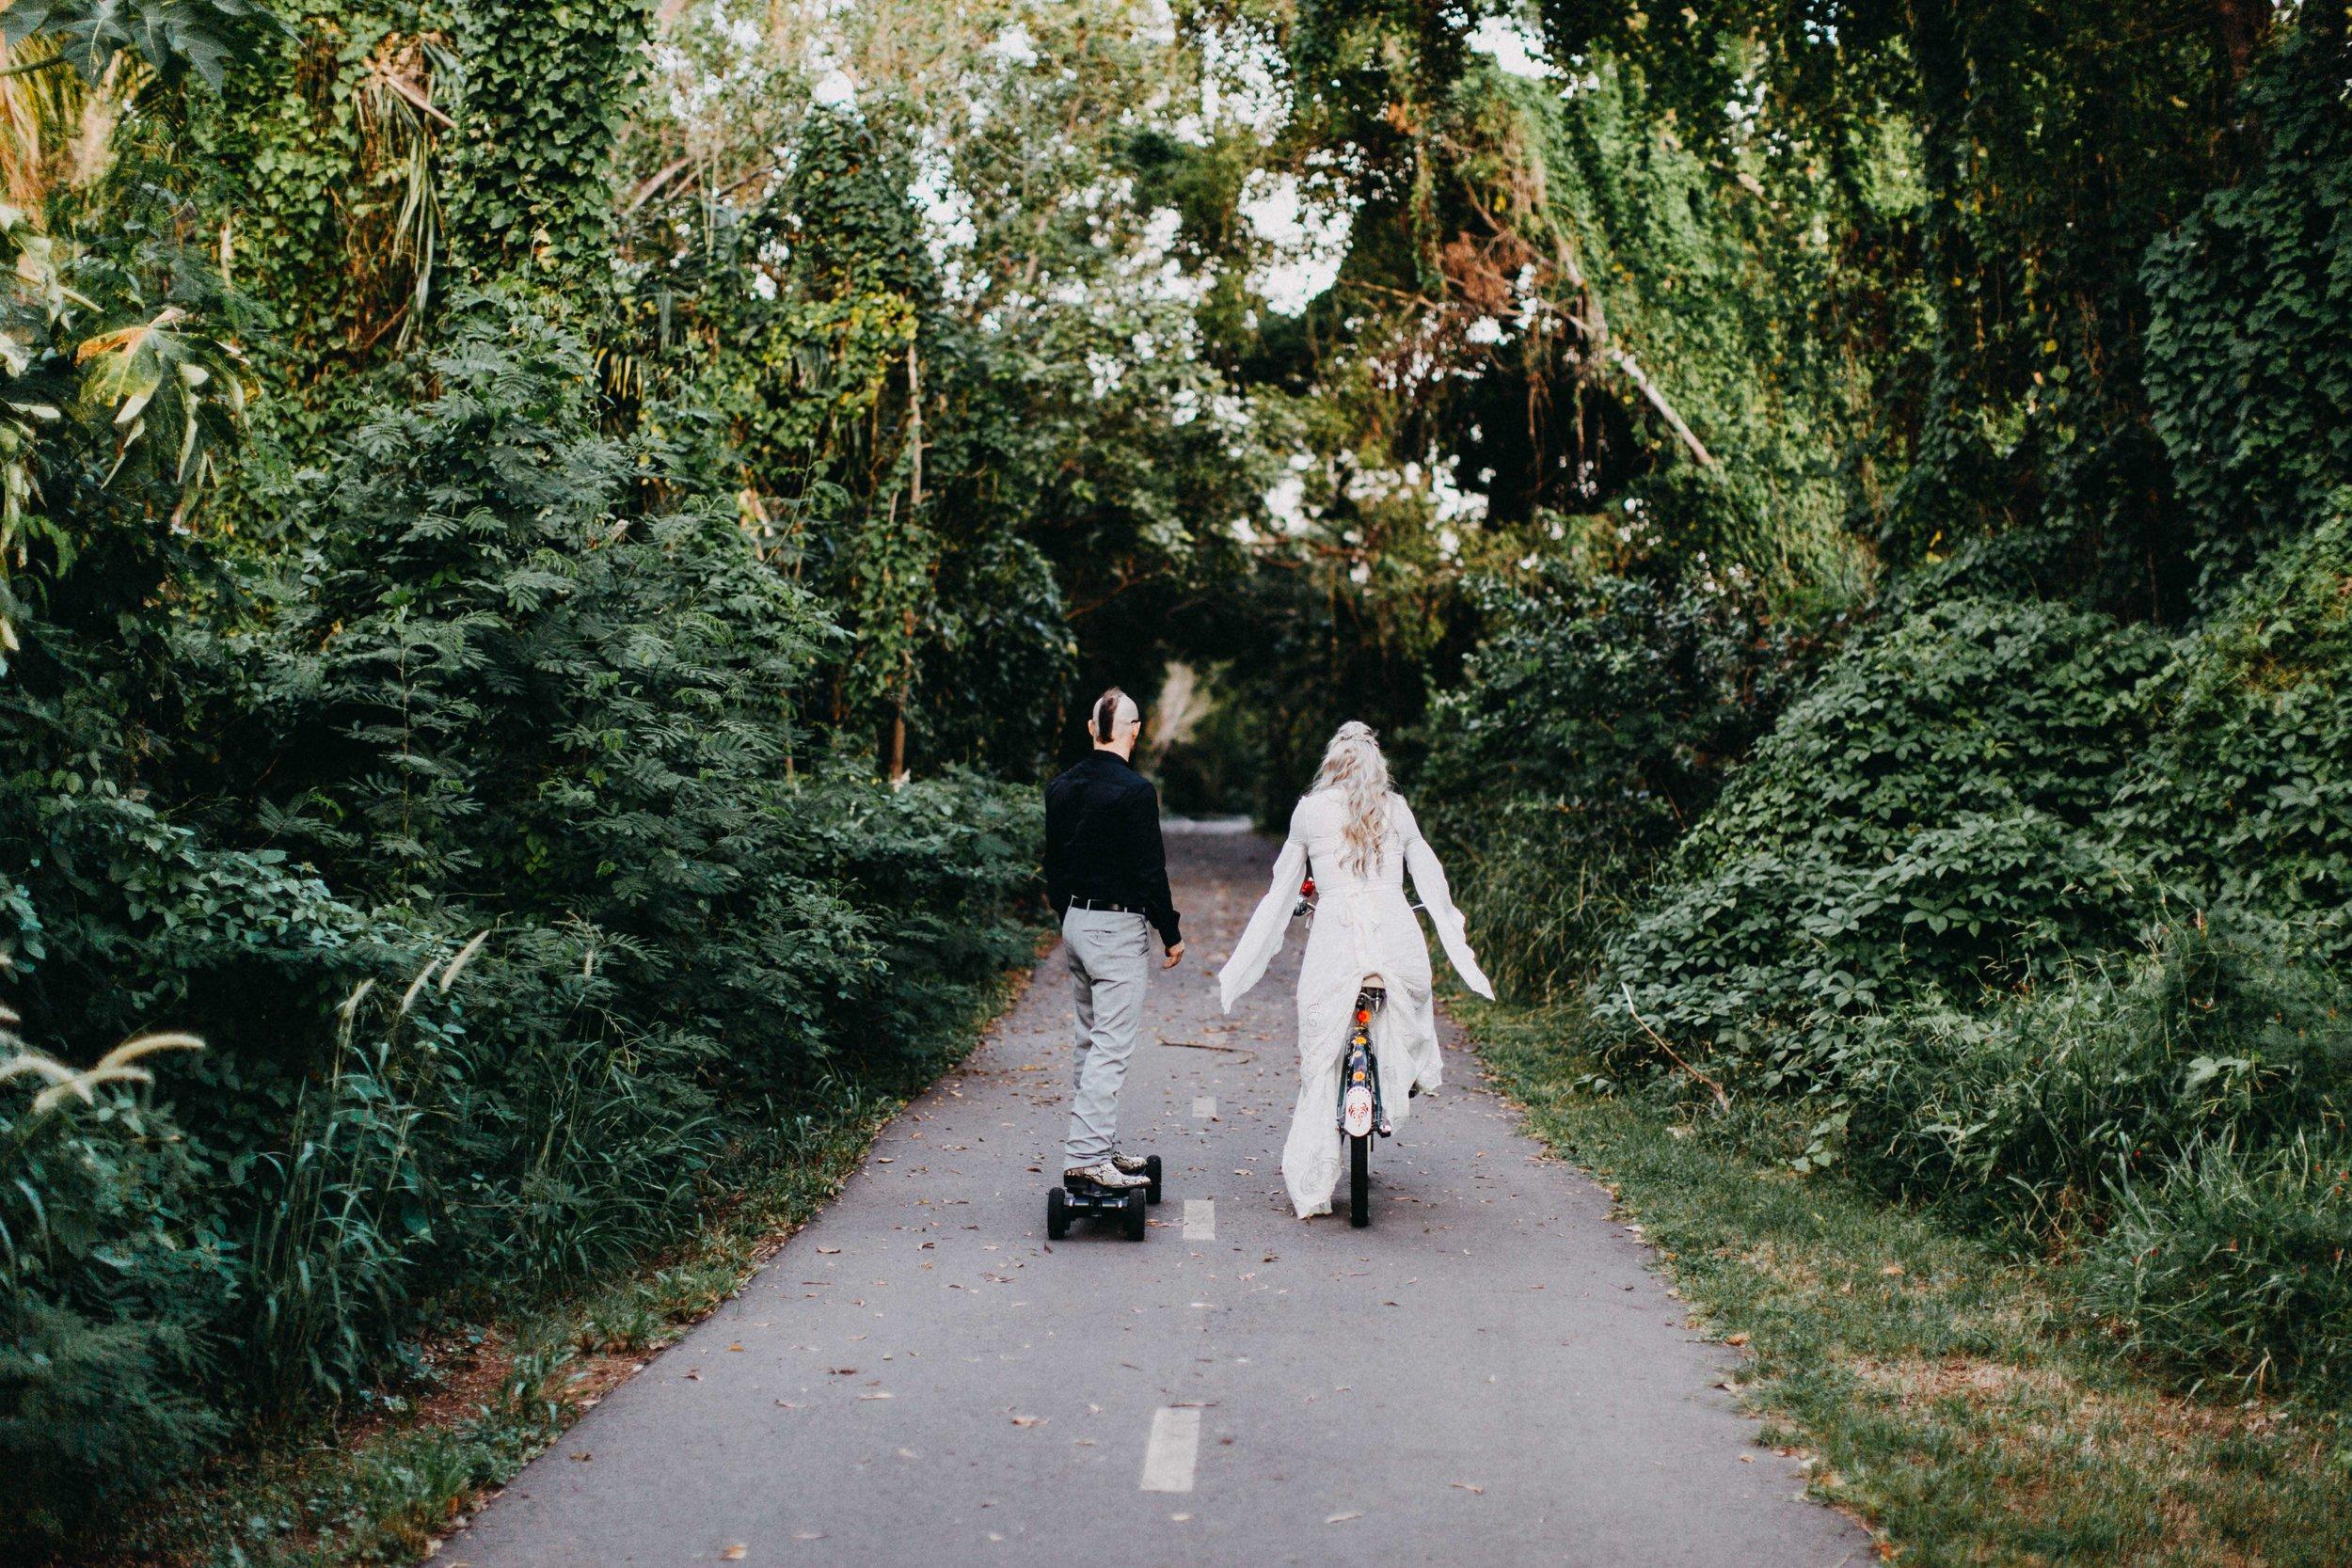 darwin-elopement-wedding-beach-camden-photography-www.emilyobrienphotography.net-46.jpg